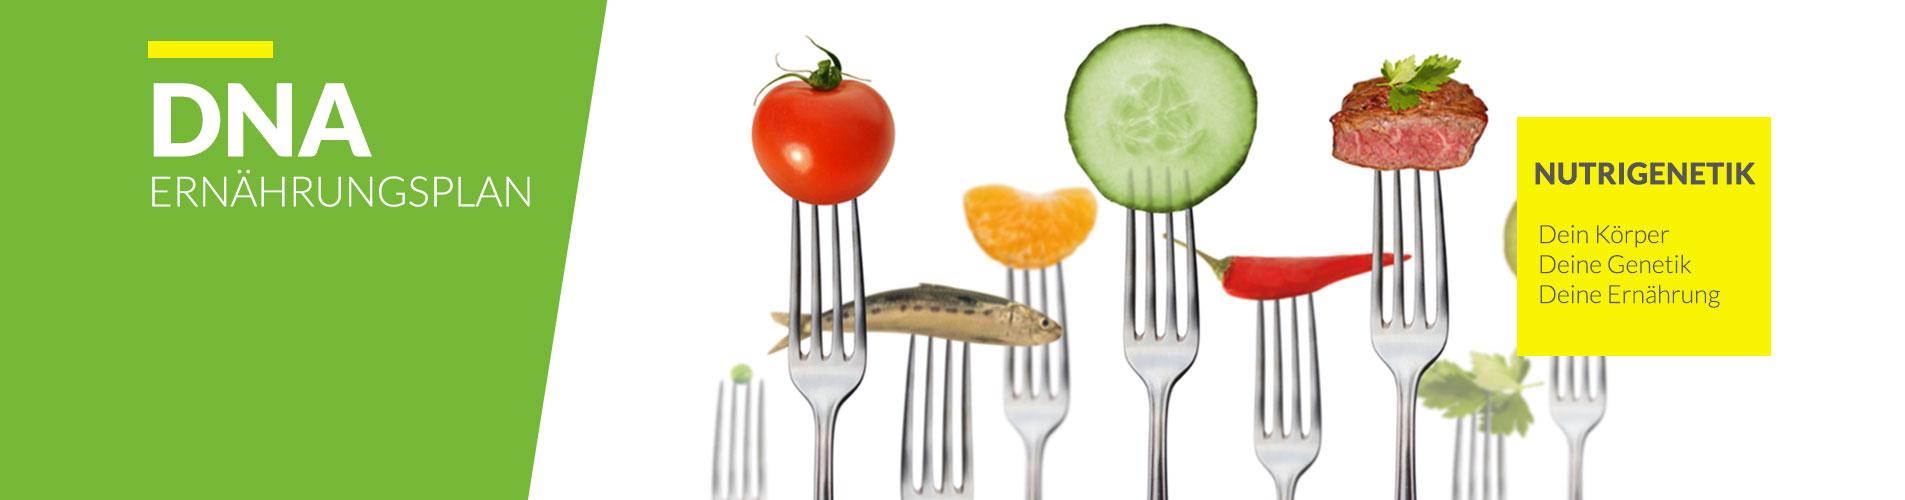 DNA-Ernährungsplan-Ernährungsberatung